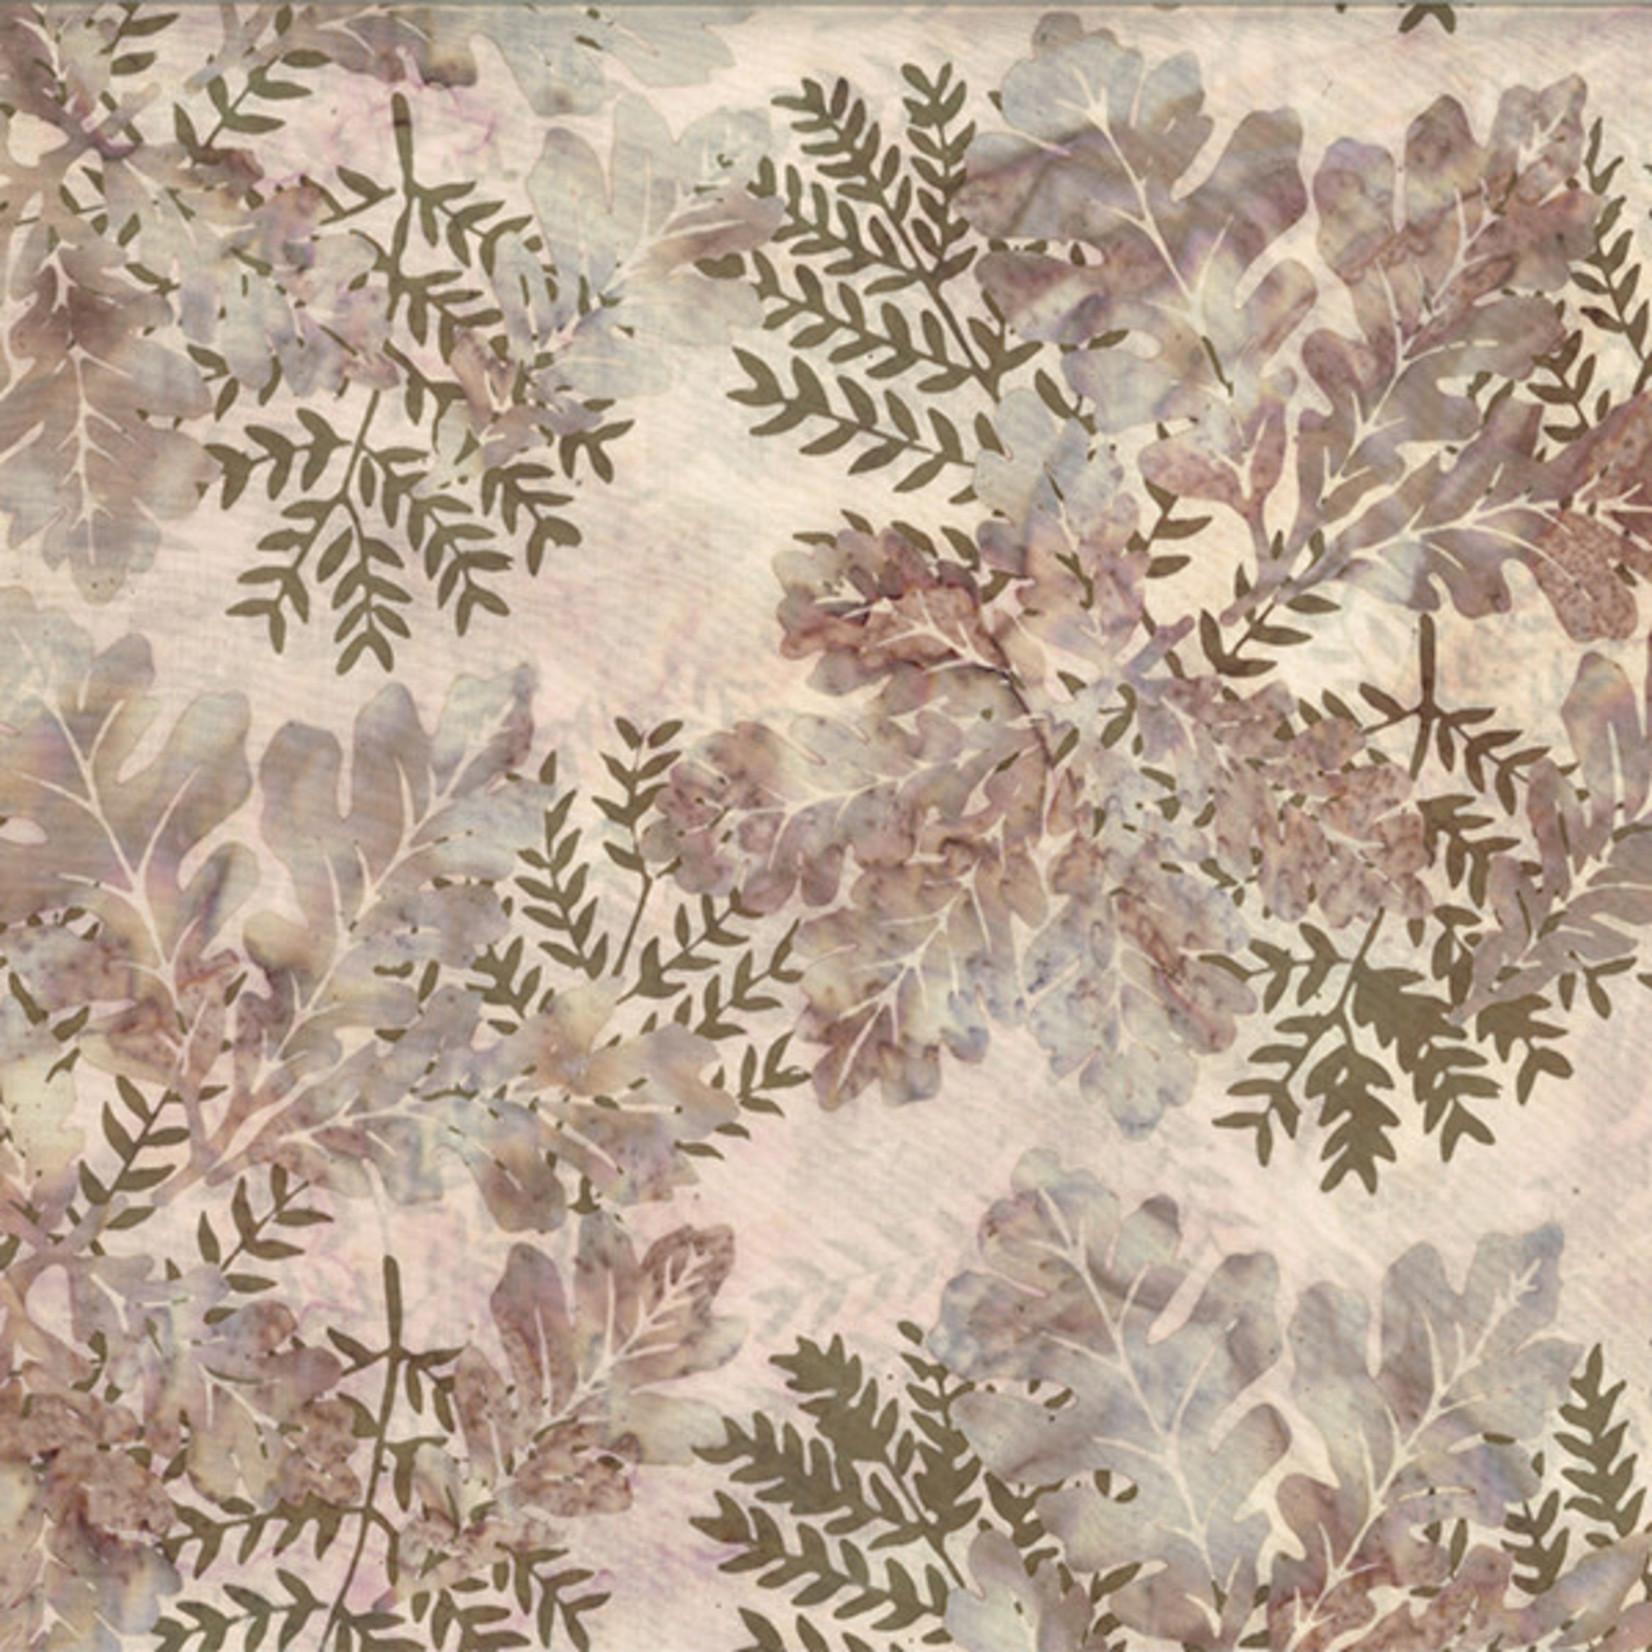 Hoffman Fabrics Bali Batik Oak Leaves 2232 - Forest